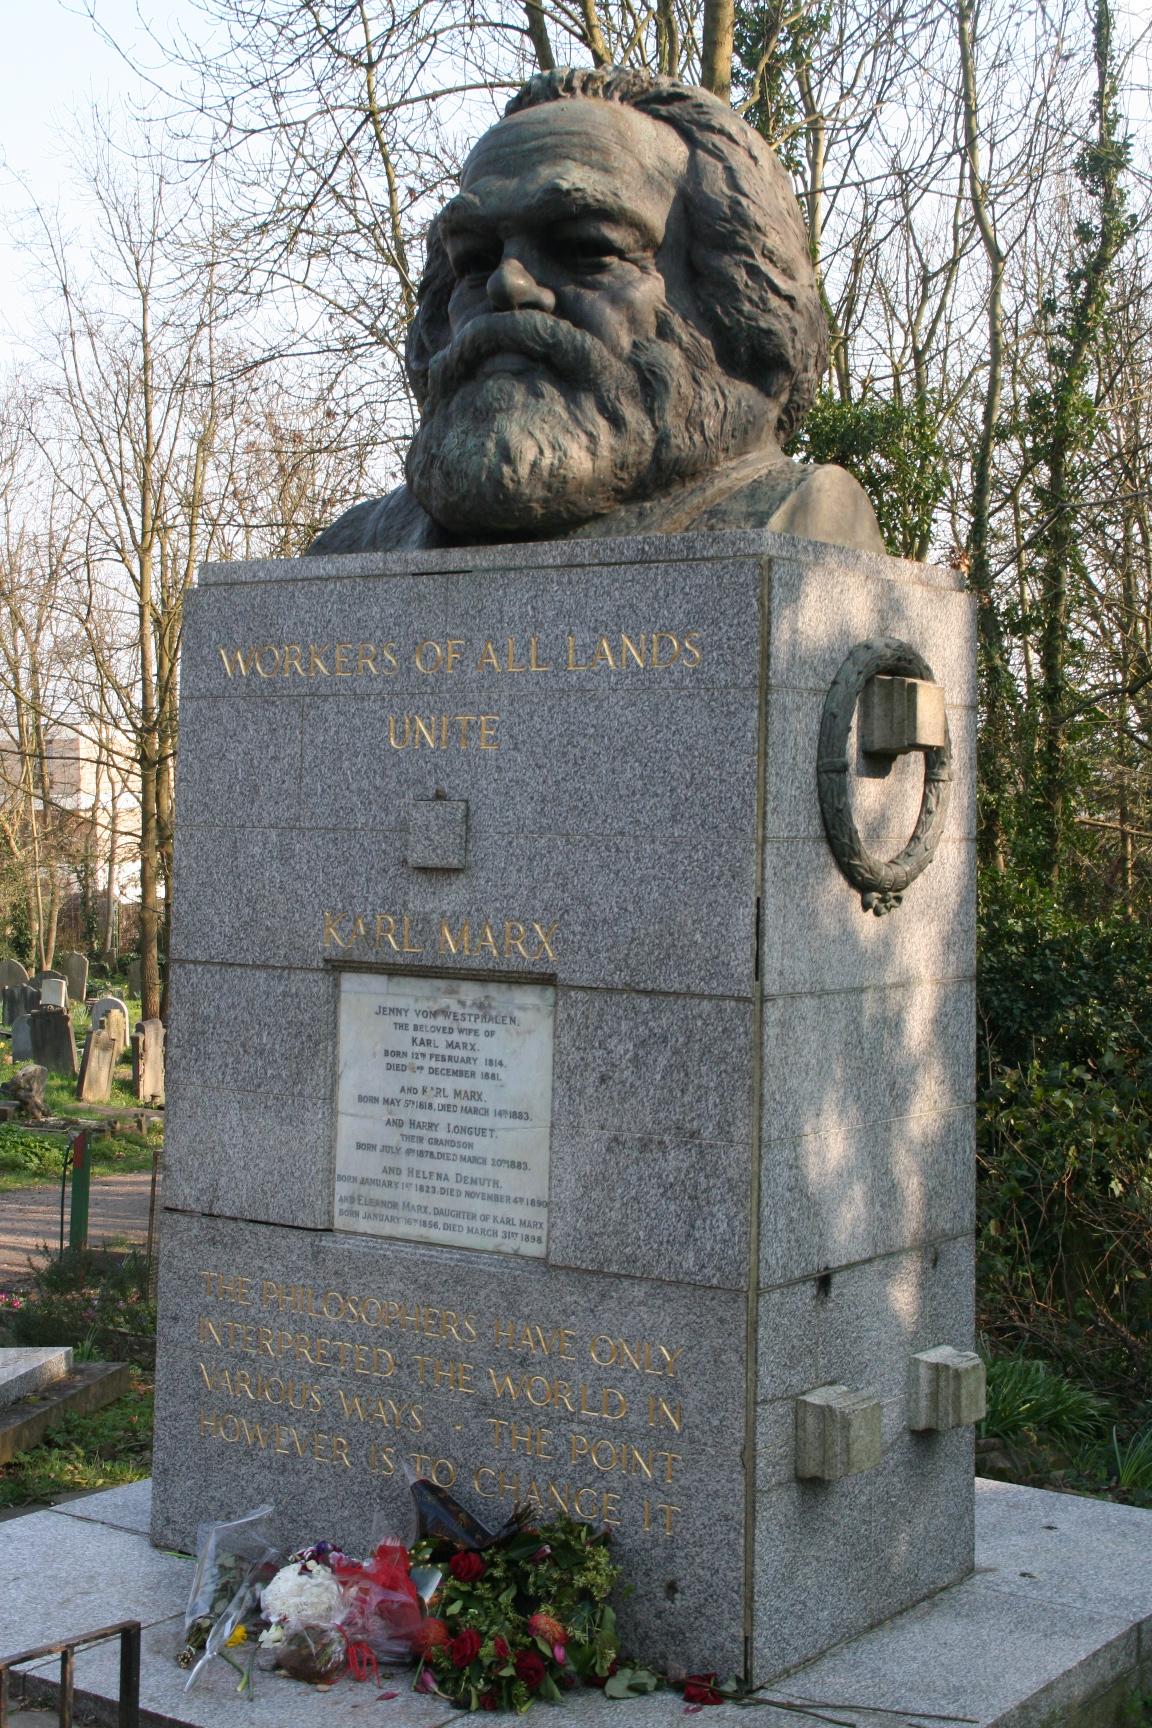 Highgate_Cemetery_-_Karl_Marx's_grave,_H